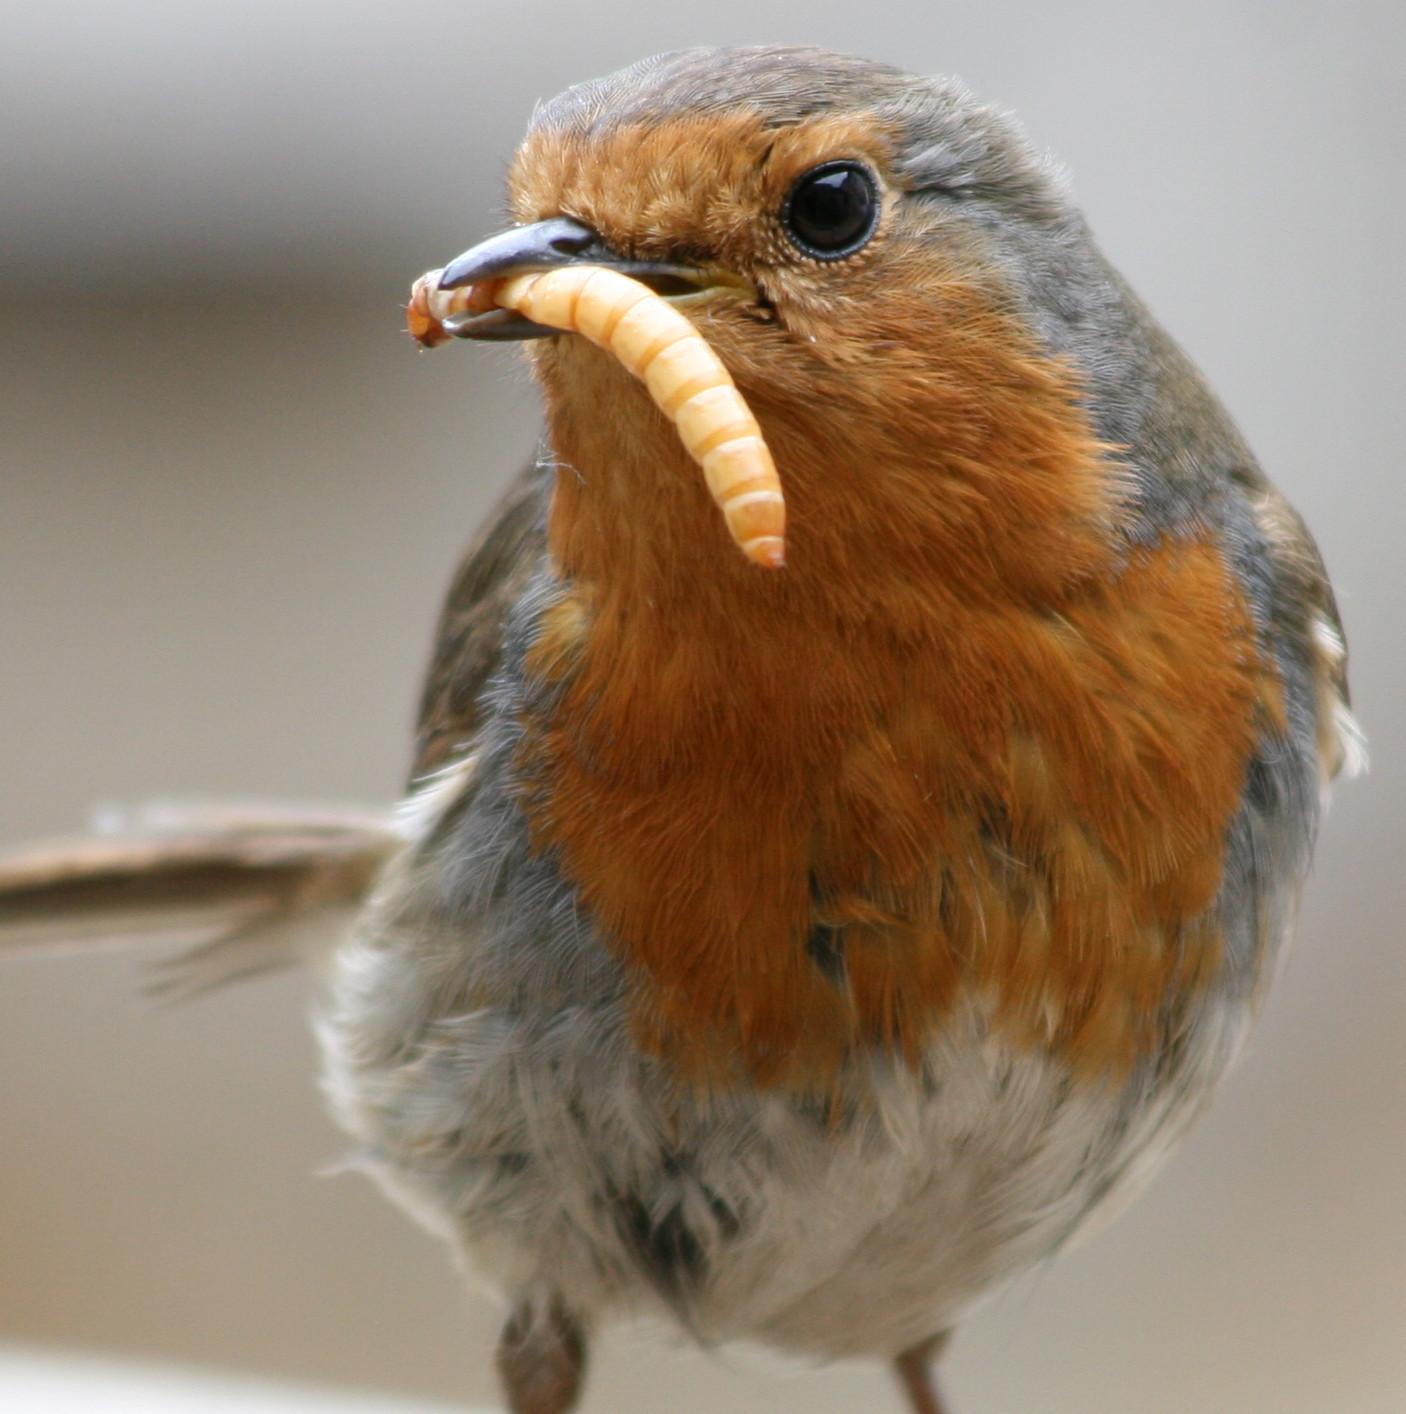 European_Robin_(Erithacus_rubecula)_with_mealworm.jpg